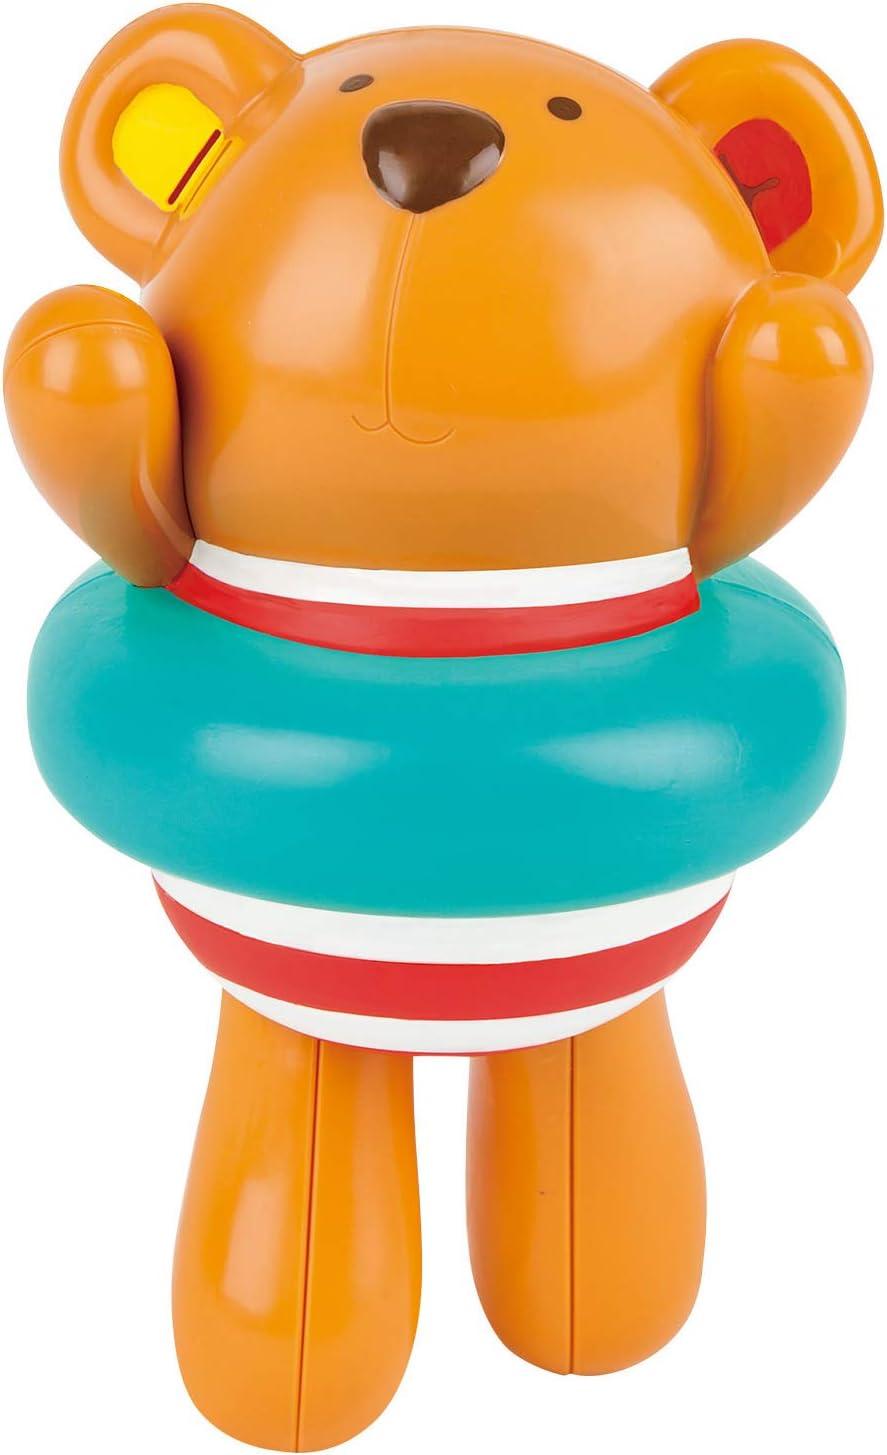 Hape Kids Little El Paso Mall Topics on TV Splashers Swimmer Teddy Bath Wind-Up Toy